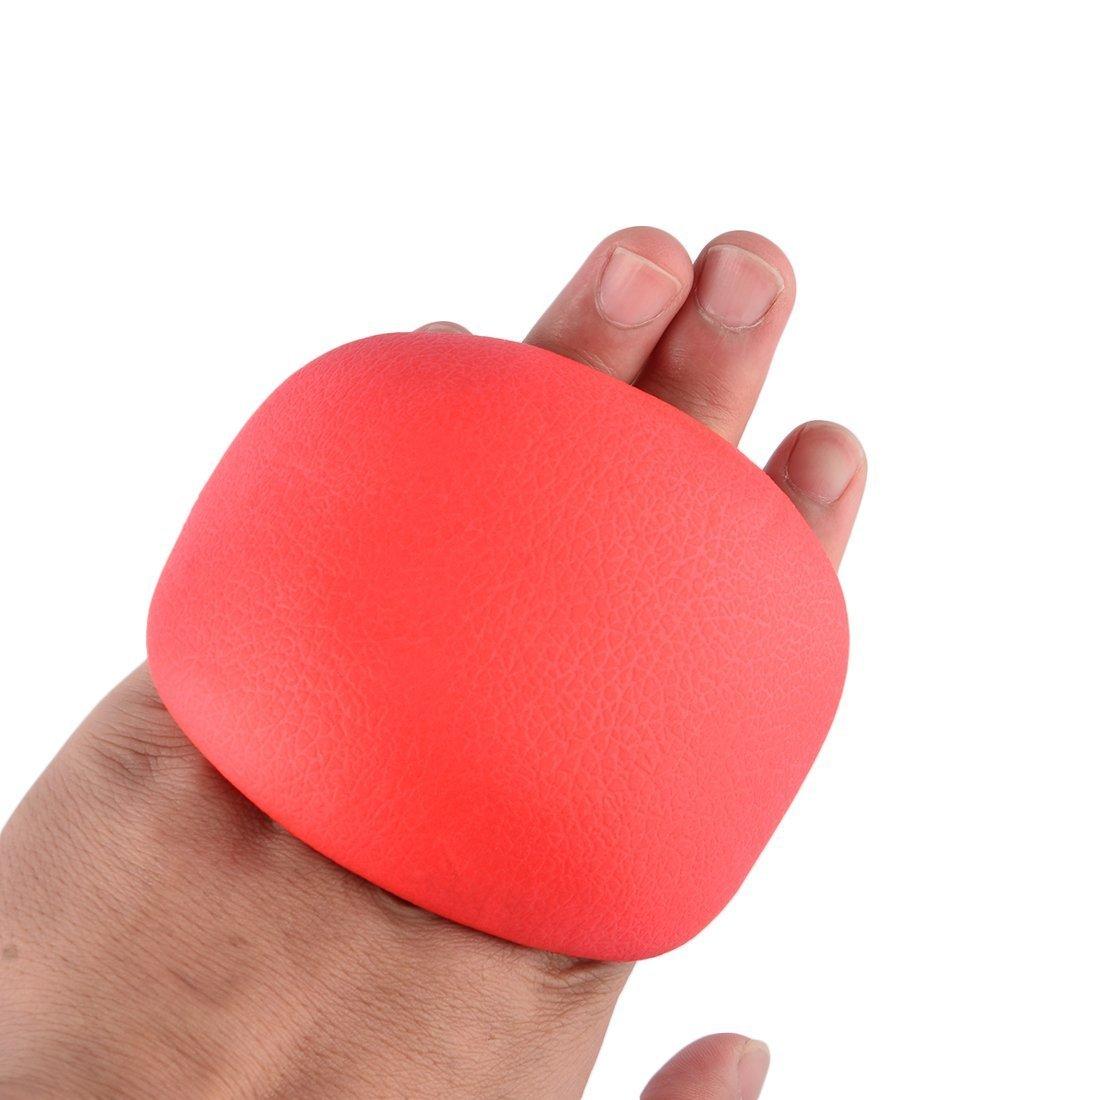 BAY/® Headball Kopfball Reflexball Reaktionsball Ball Stirnband Reaktion Boxen Kickboxen Reflex Training Trainingsset DELUX PROFI Punchingball Speedball Boxsack Boxset Kopf Reflextraining